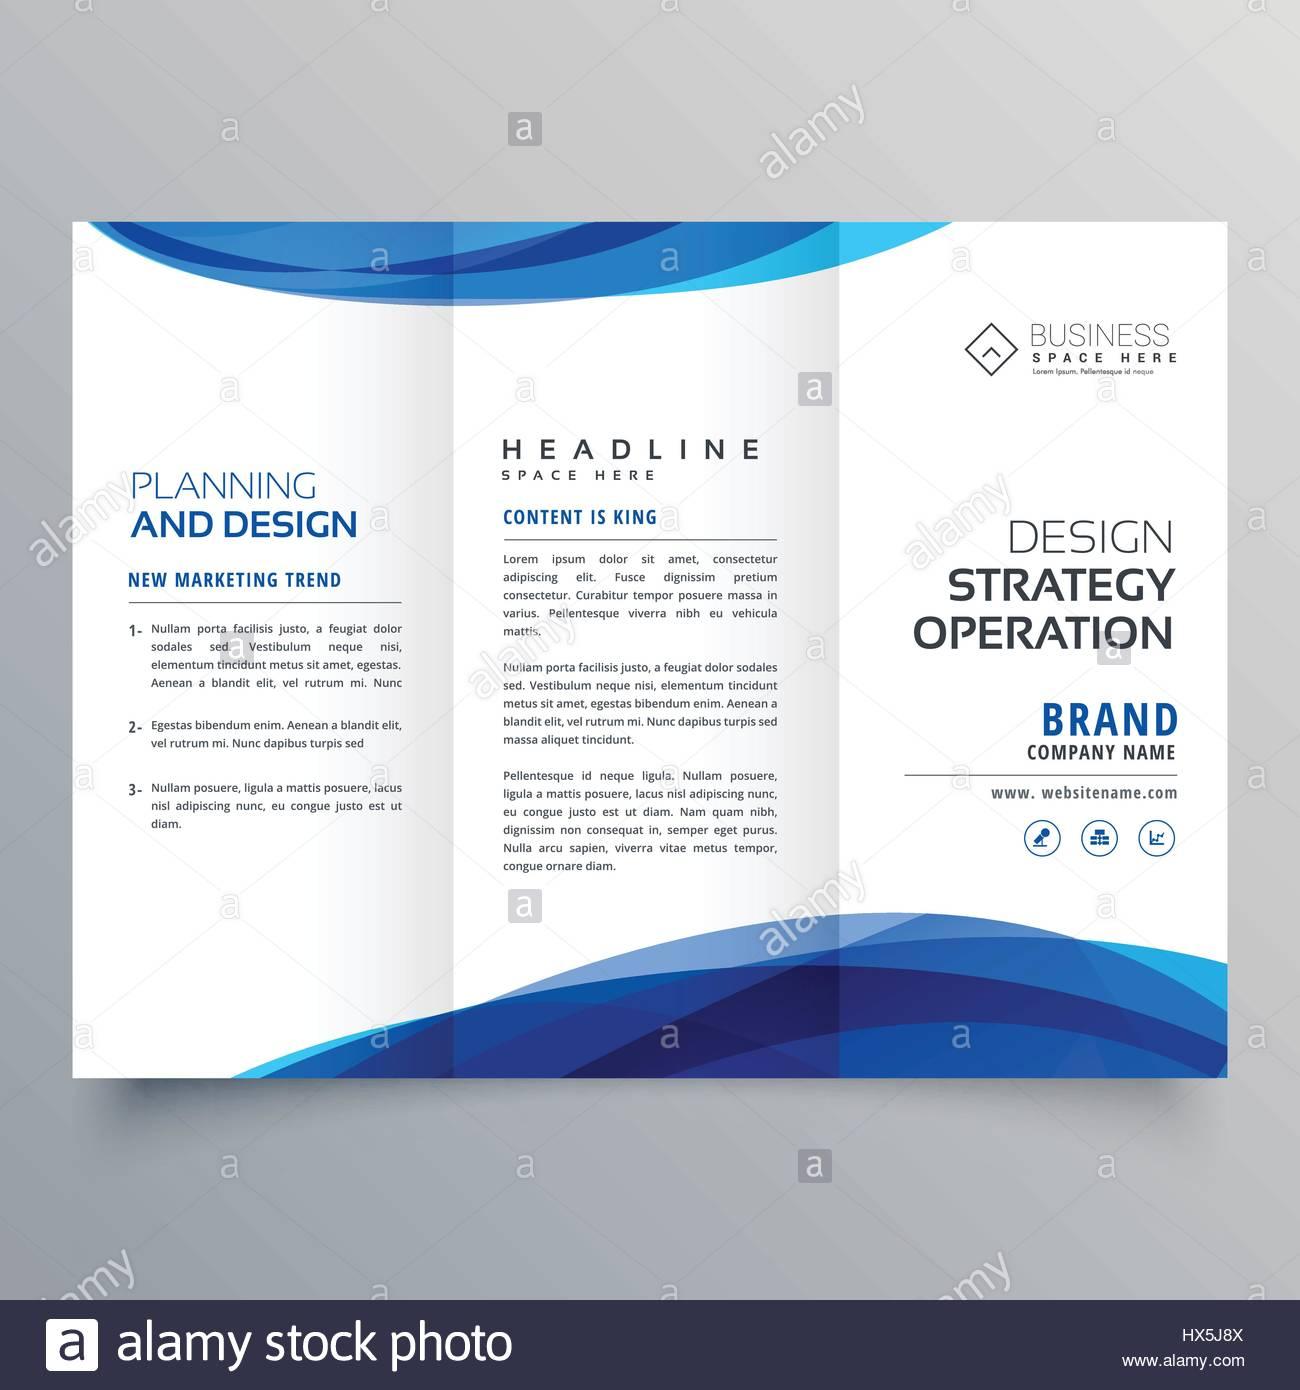 Charmant Faltbare Broschüre Vorlage Ideen - Entry Level Resume ...